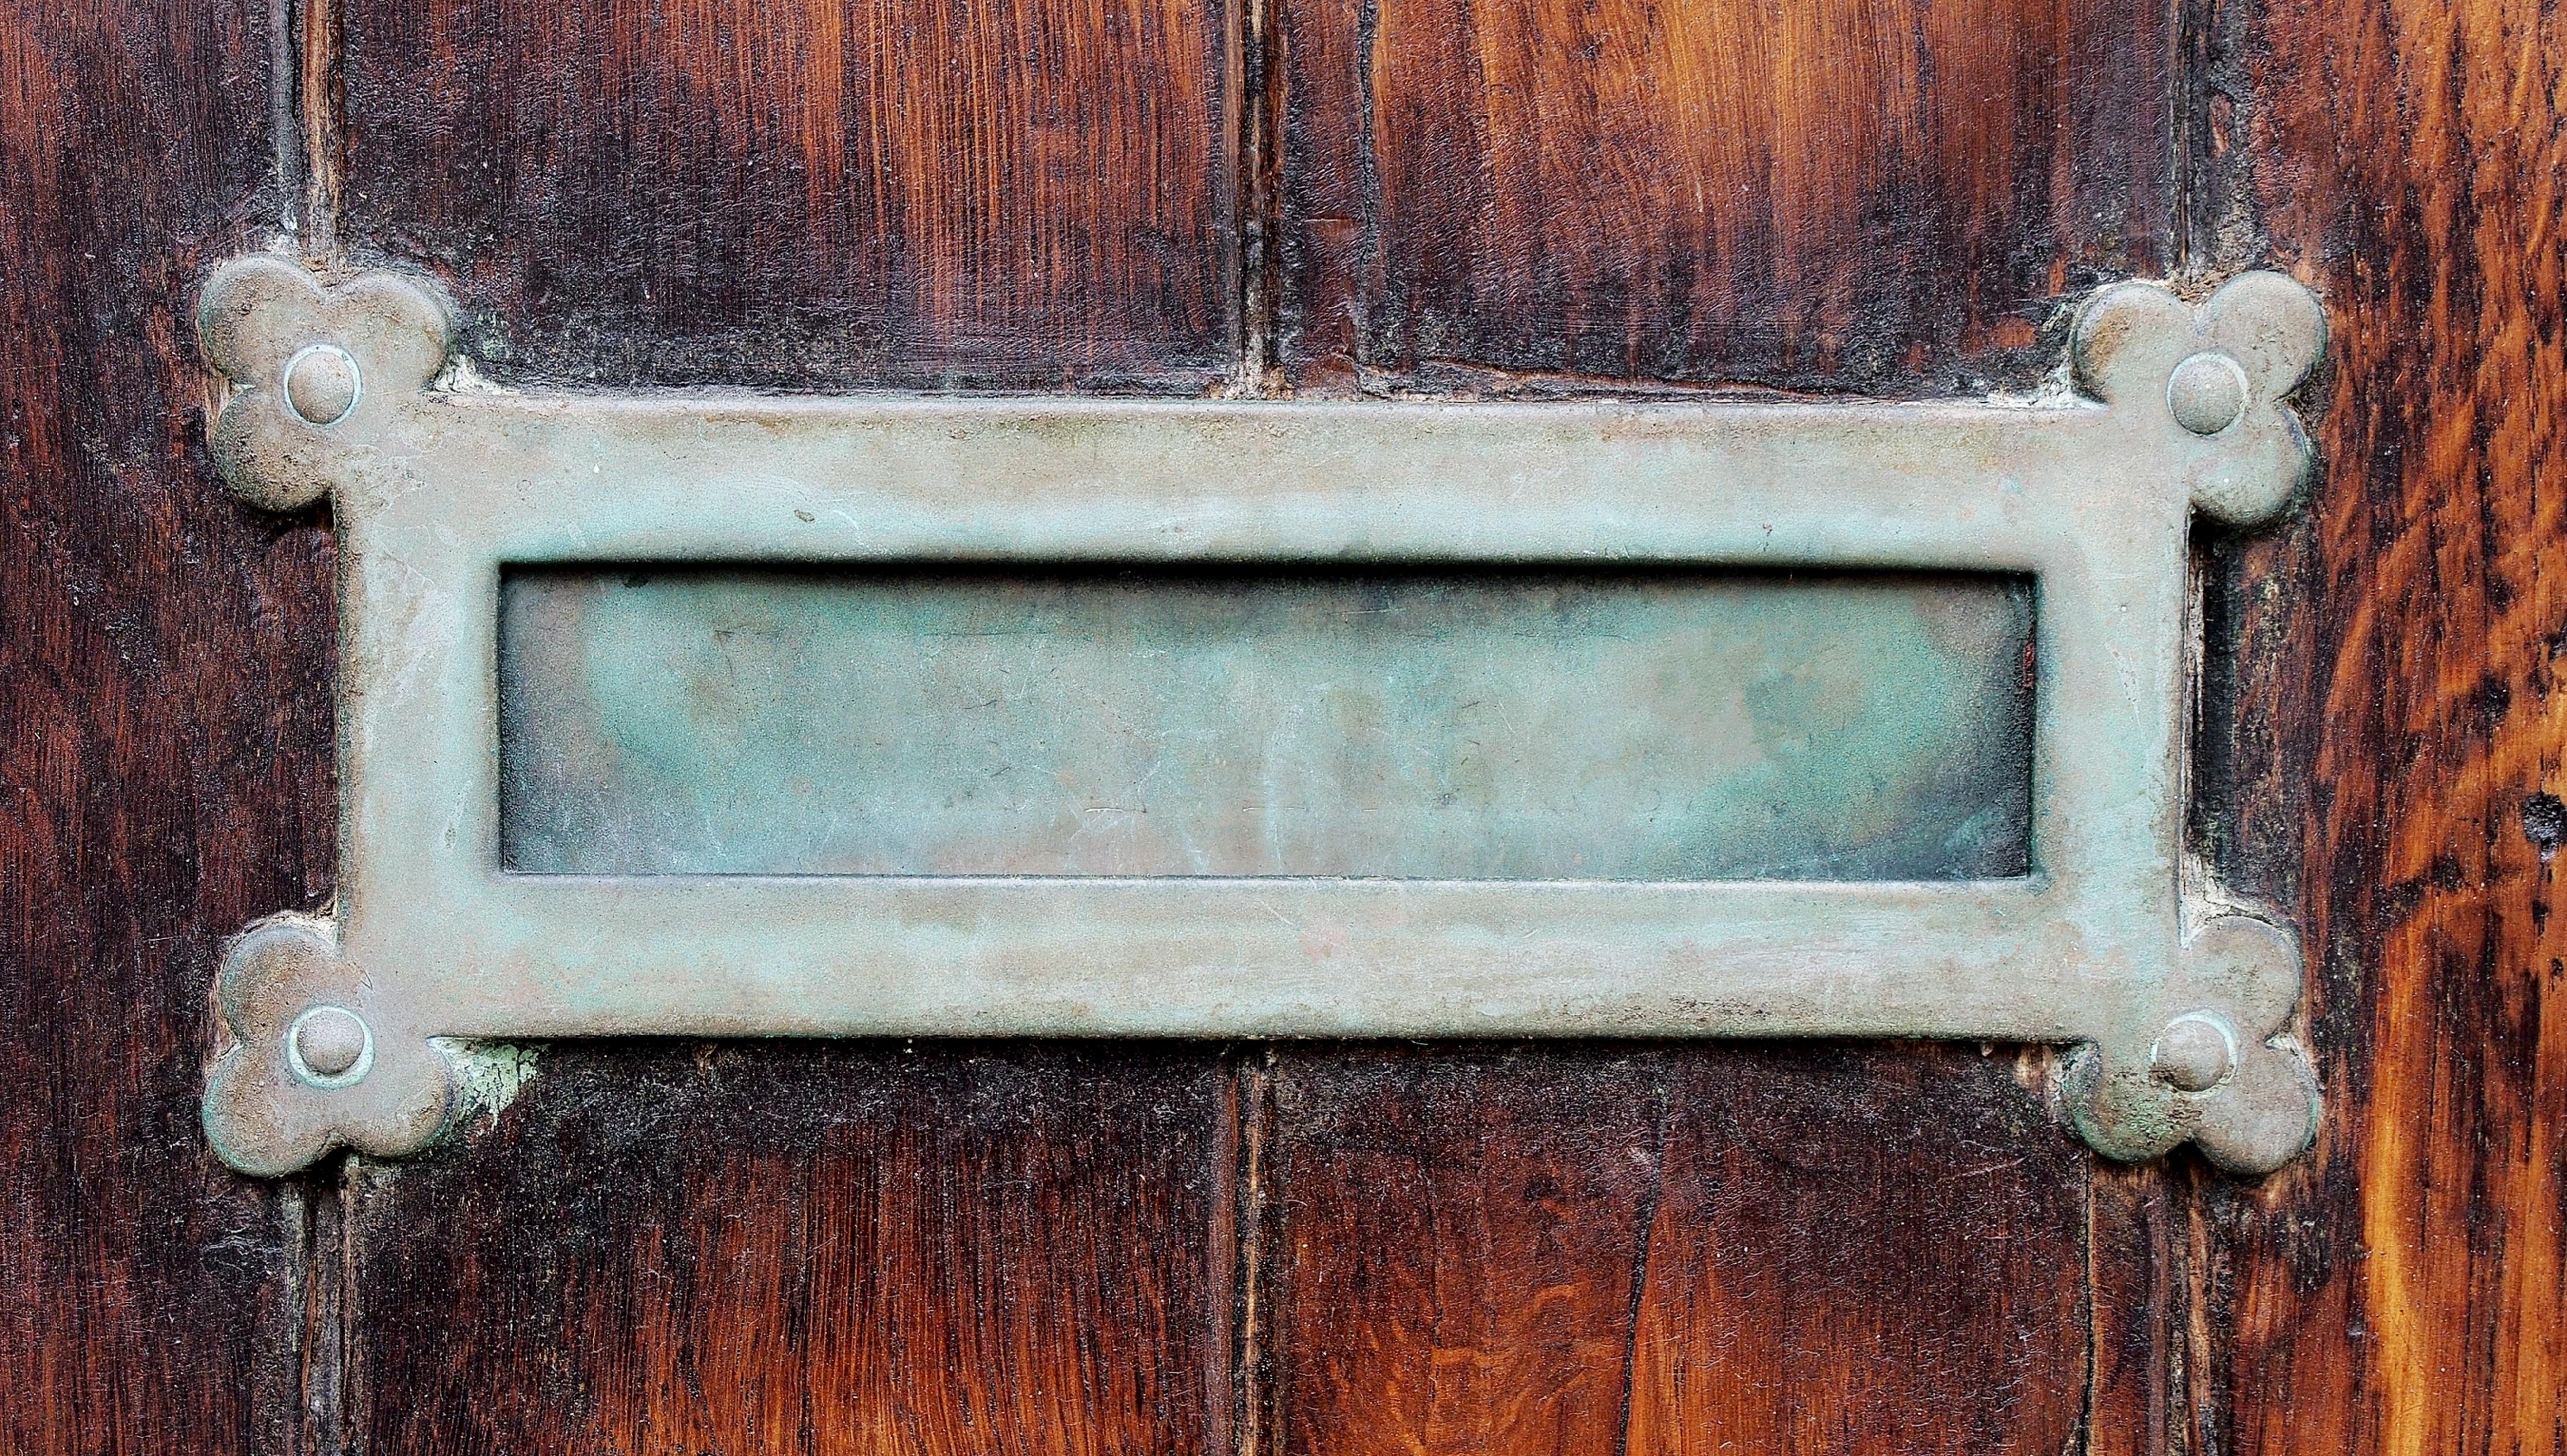 Fotos gratis : enviar, madera, antiguo, ventana, pared, carta, metal ...